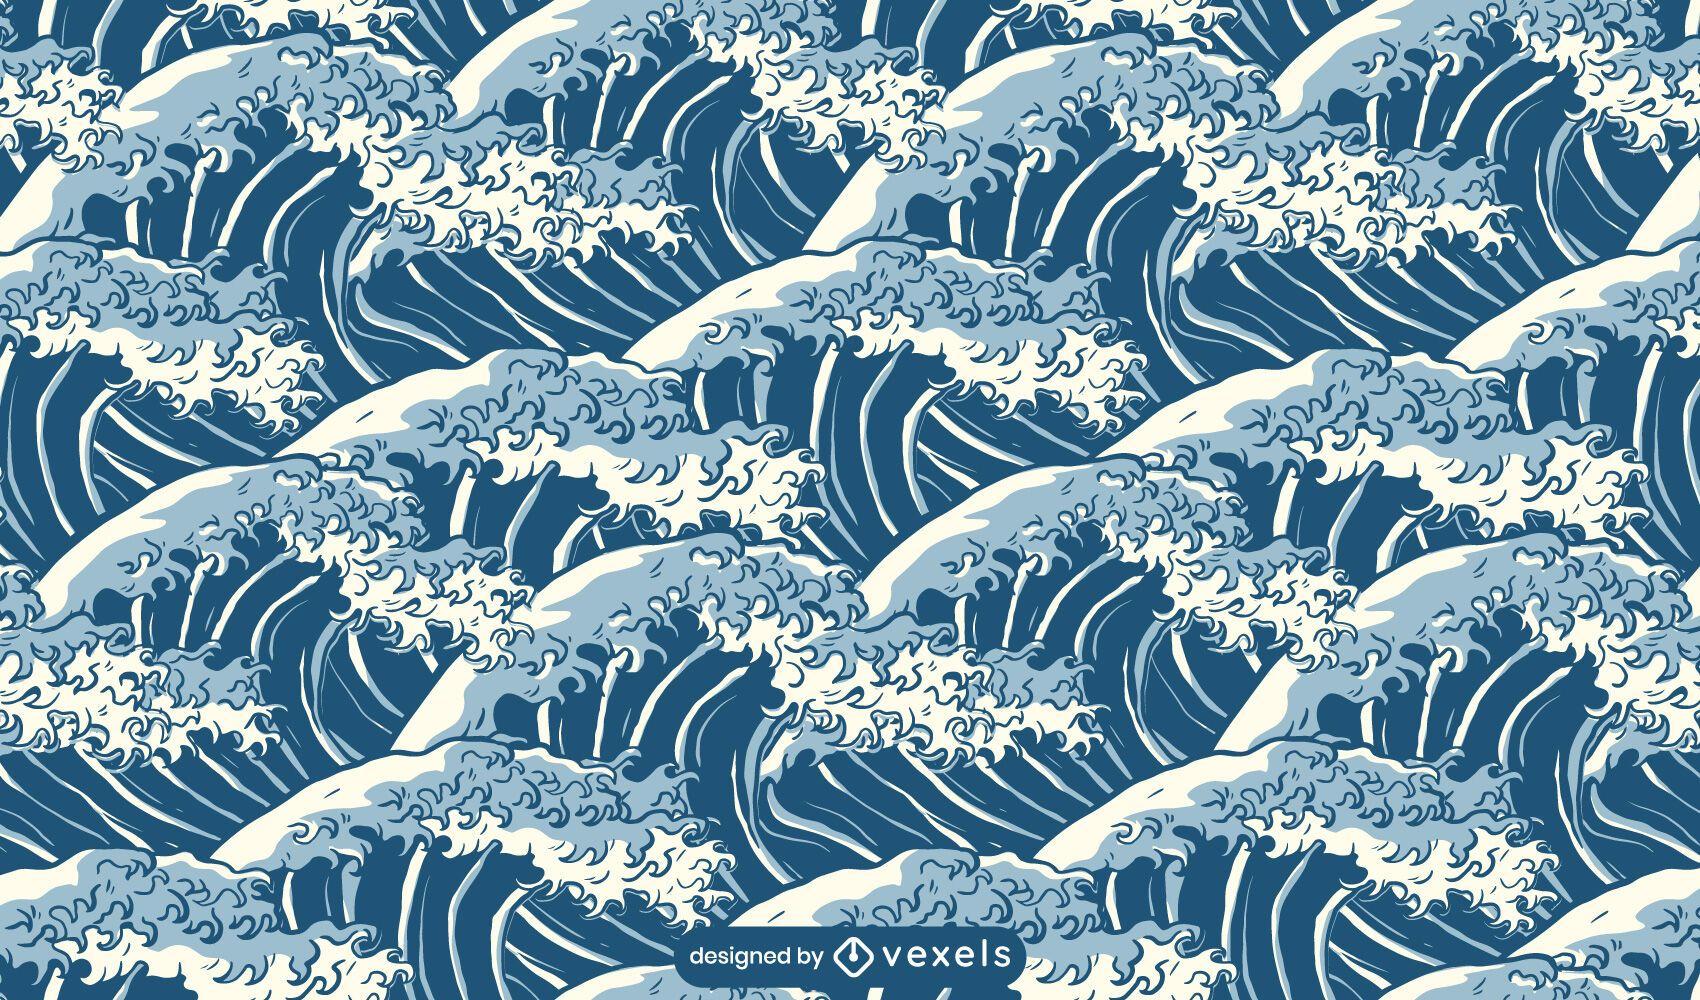 Ocean wave nature pattern design